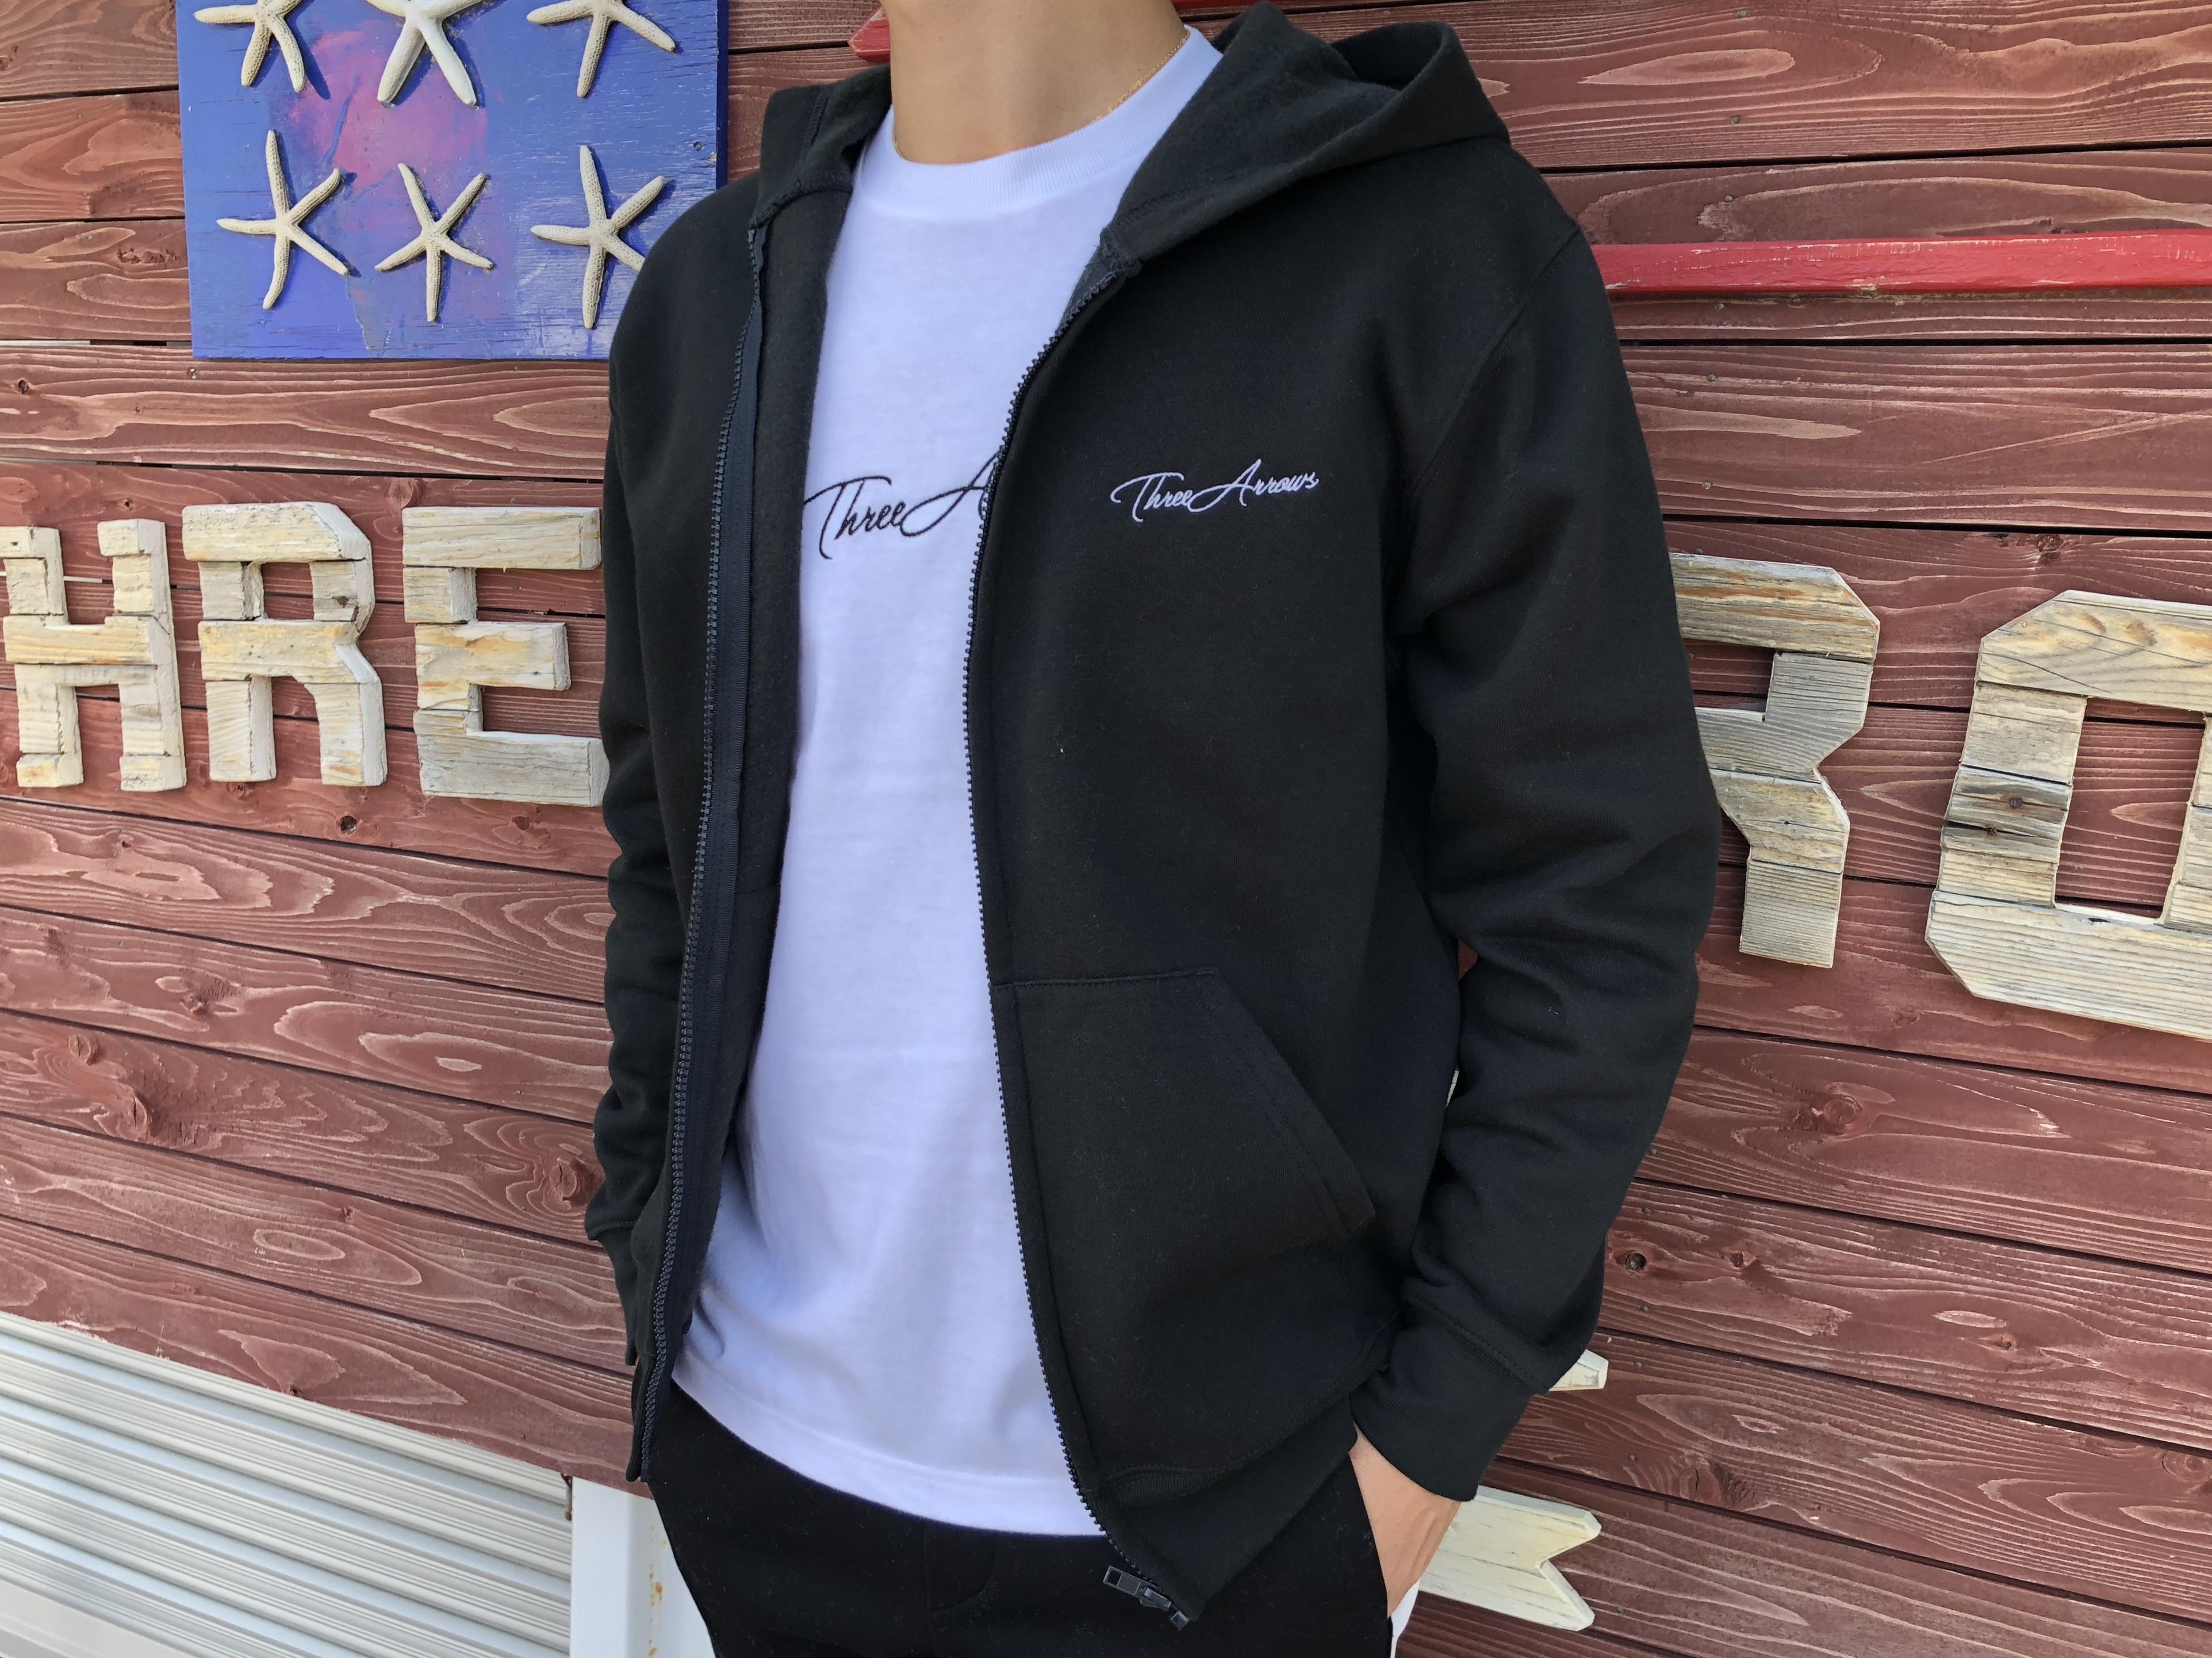 ThreeArrows point刺繍ZIPパーカー (black)